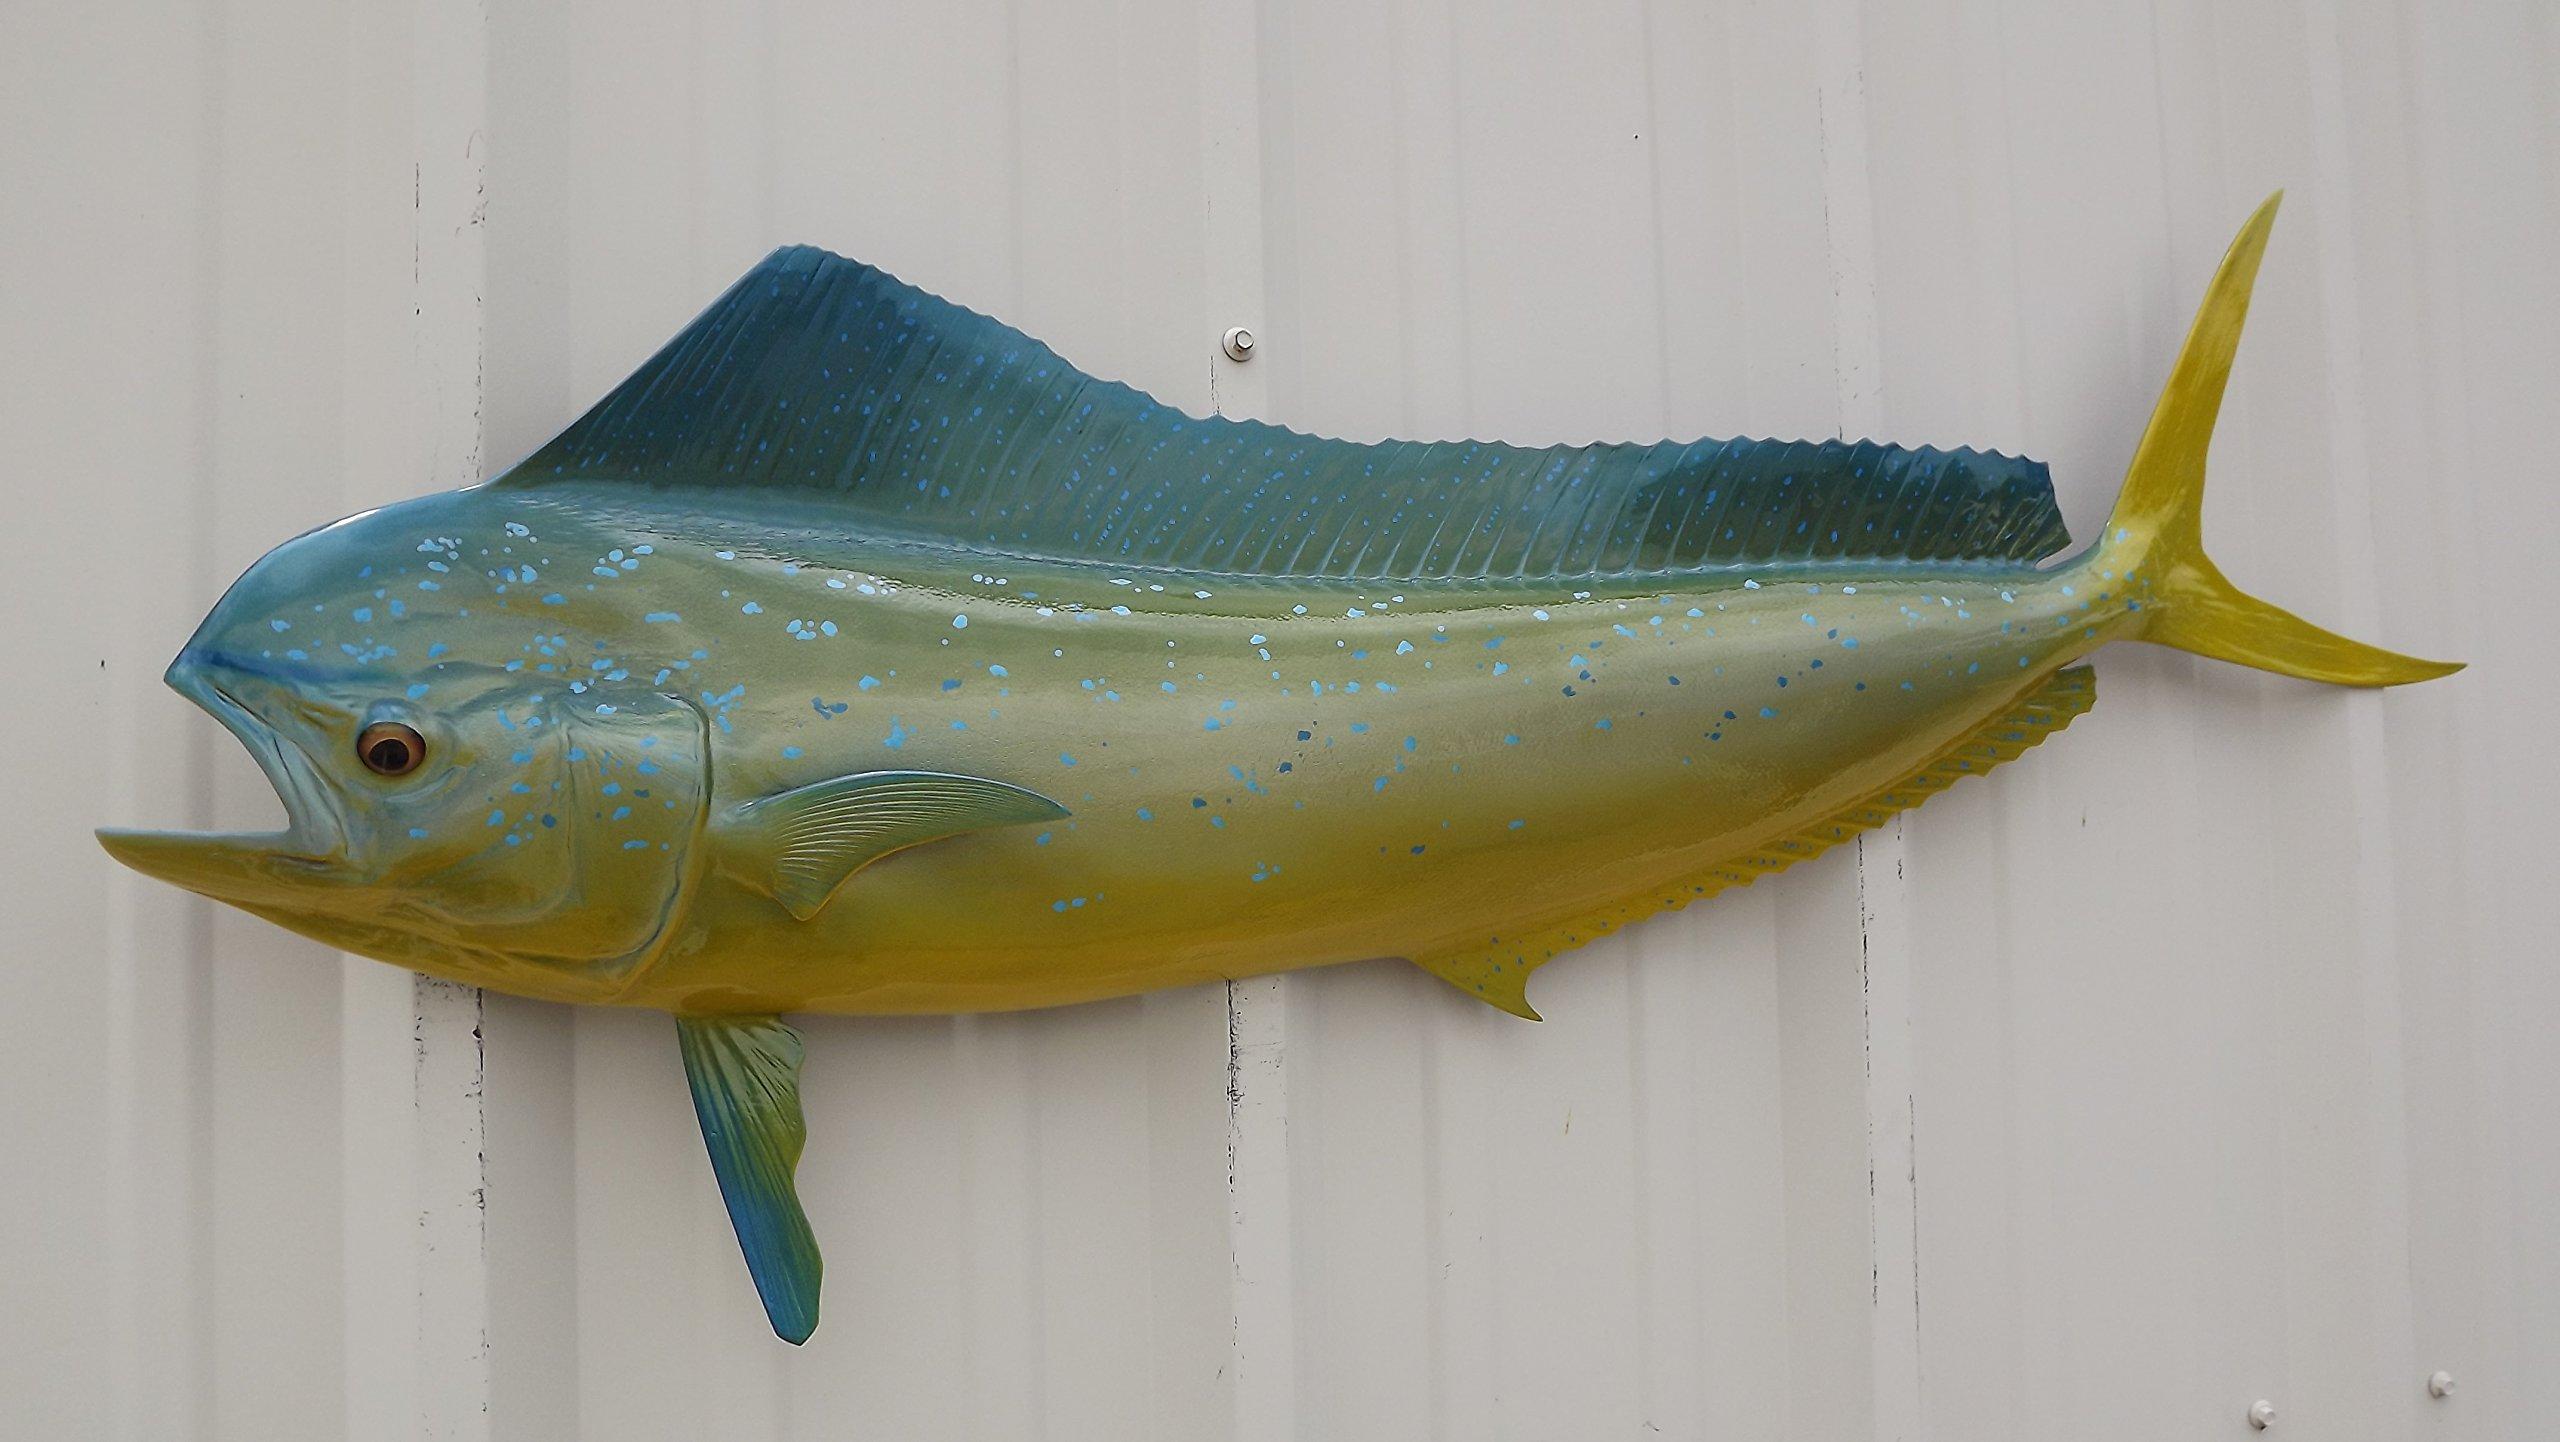 42'' Cow Mahi Half Sided Fish Mount Replica, Affordable Coastal Decor - Indoors Or Outside